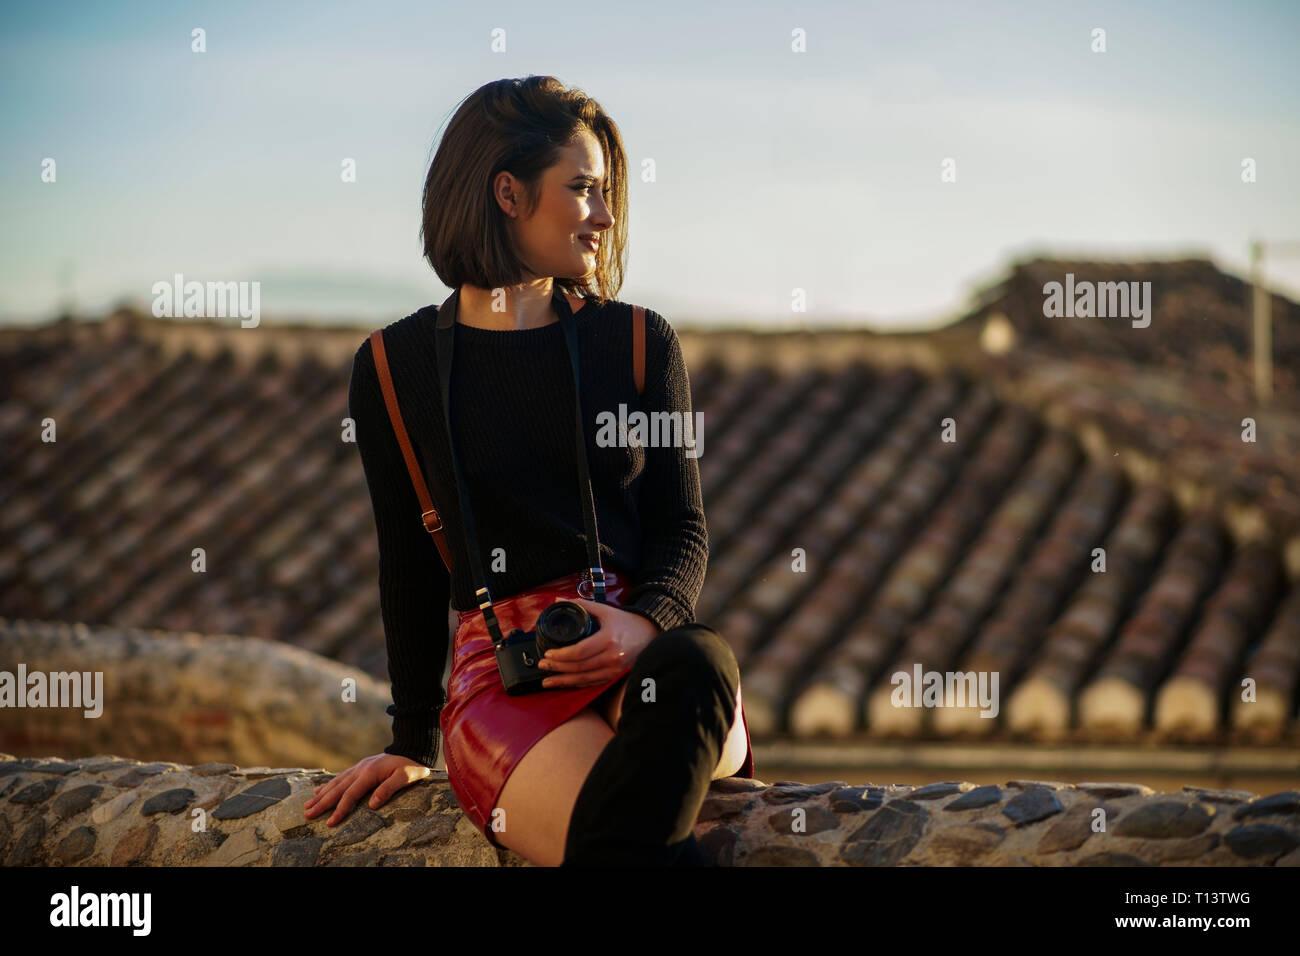 e2318161fb40 Minirock Stockfotos & Minirock Bilder - Seite 2 - Alamy